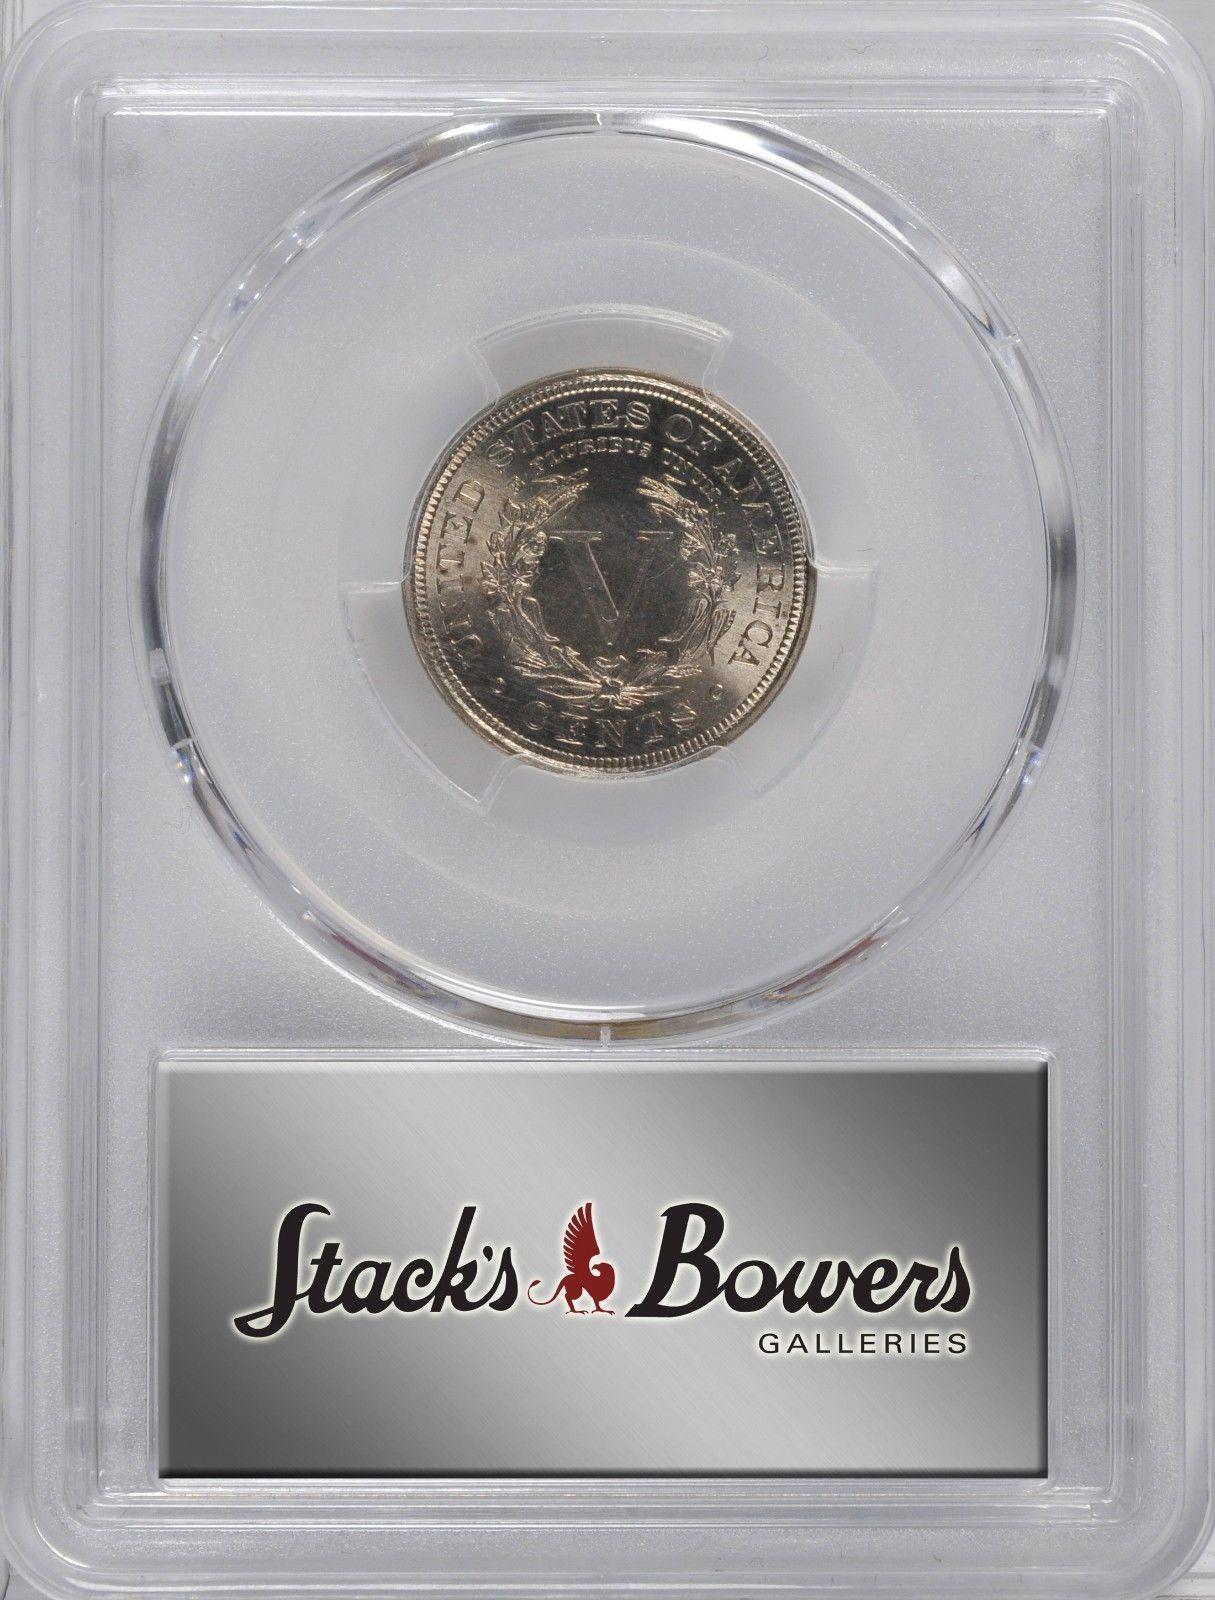 1900 Liberty Head Nickel - PCGS MS-66  - Mint State 66 - V Nickel image 4